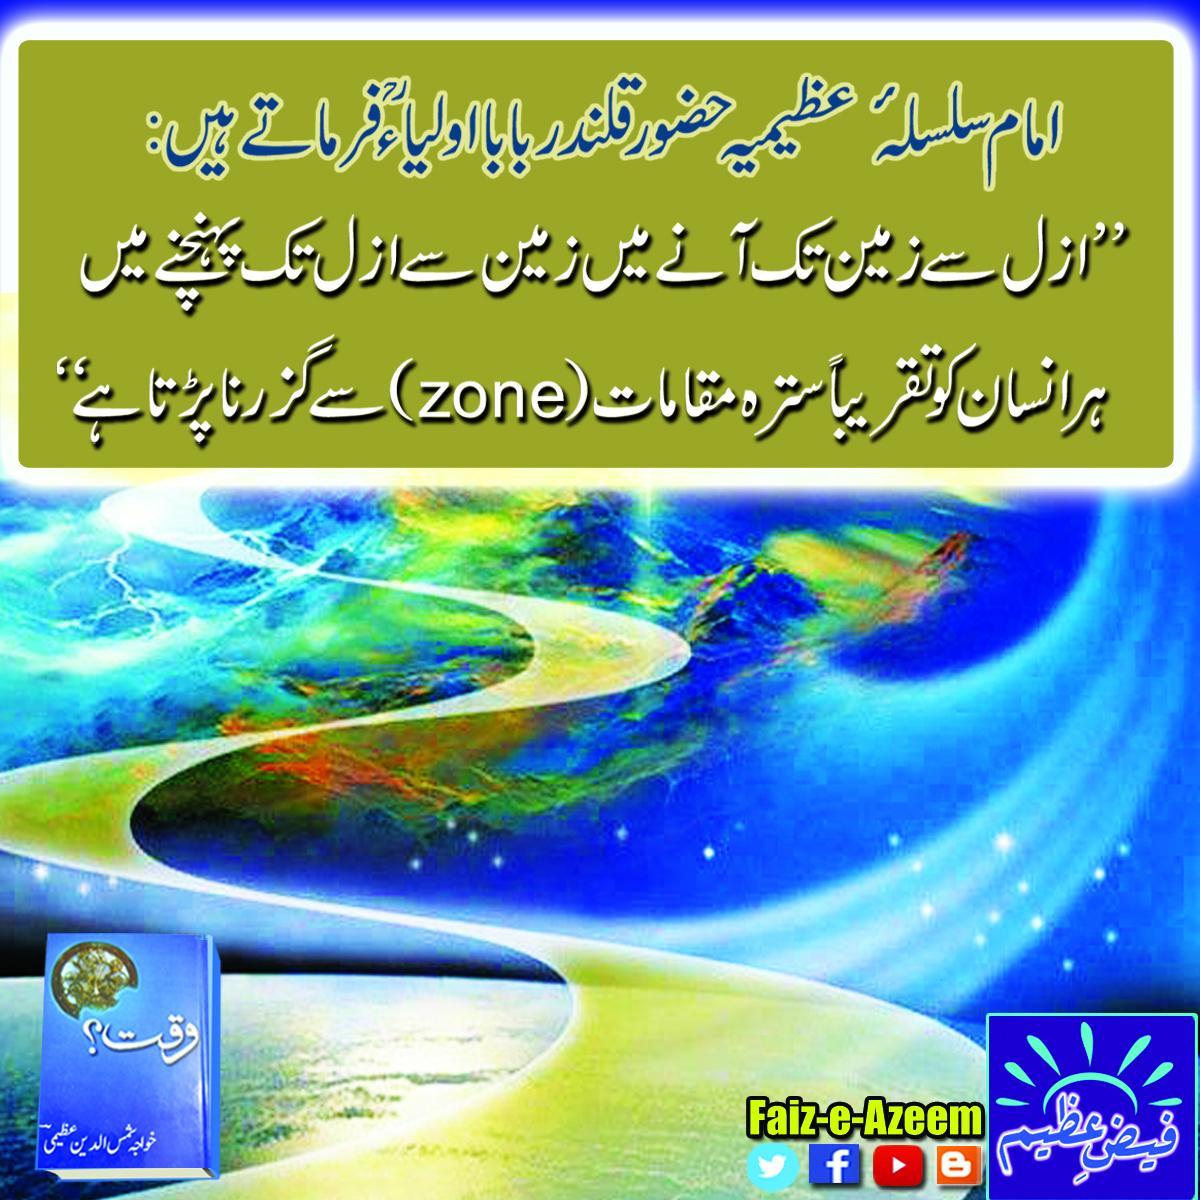 Faiz-e-Azeem: Quotes of Huzoor Qalandar Baba Auliya(R A)